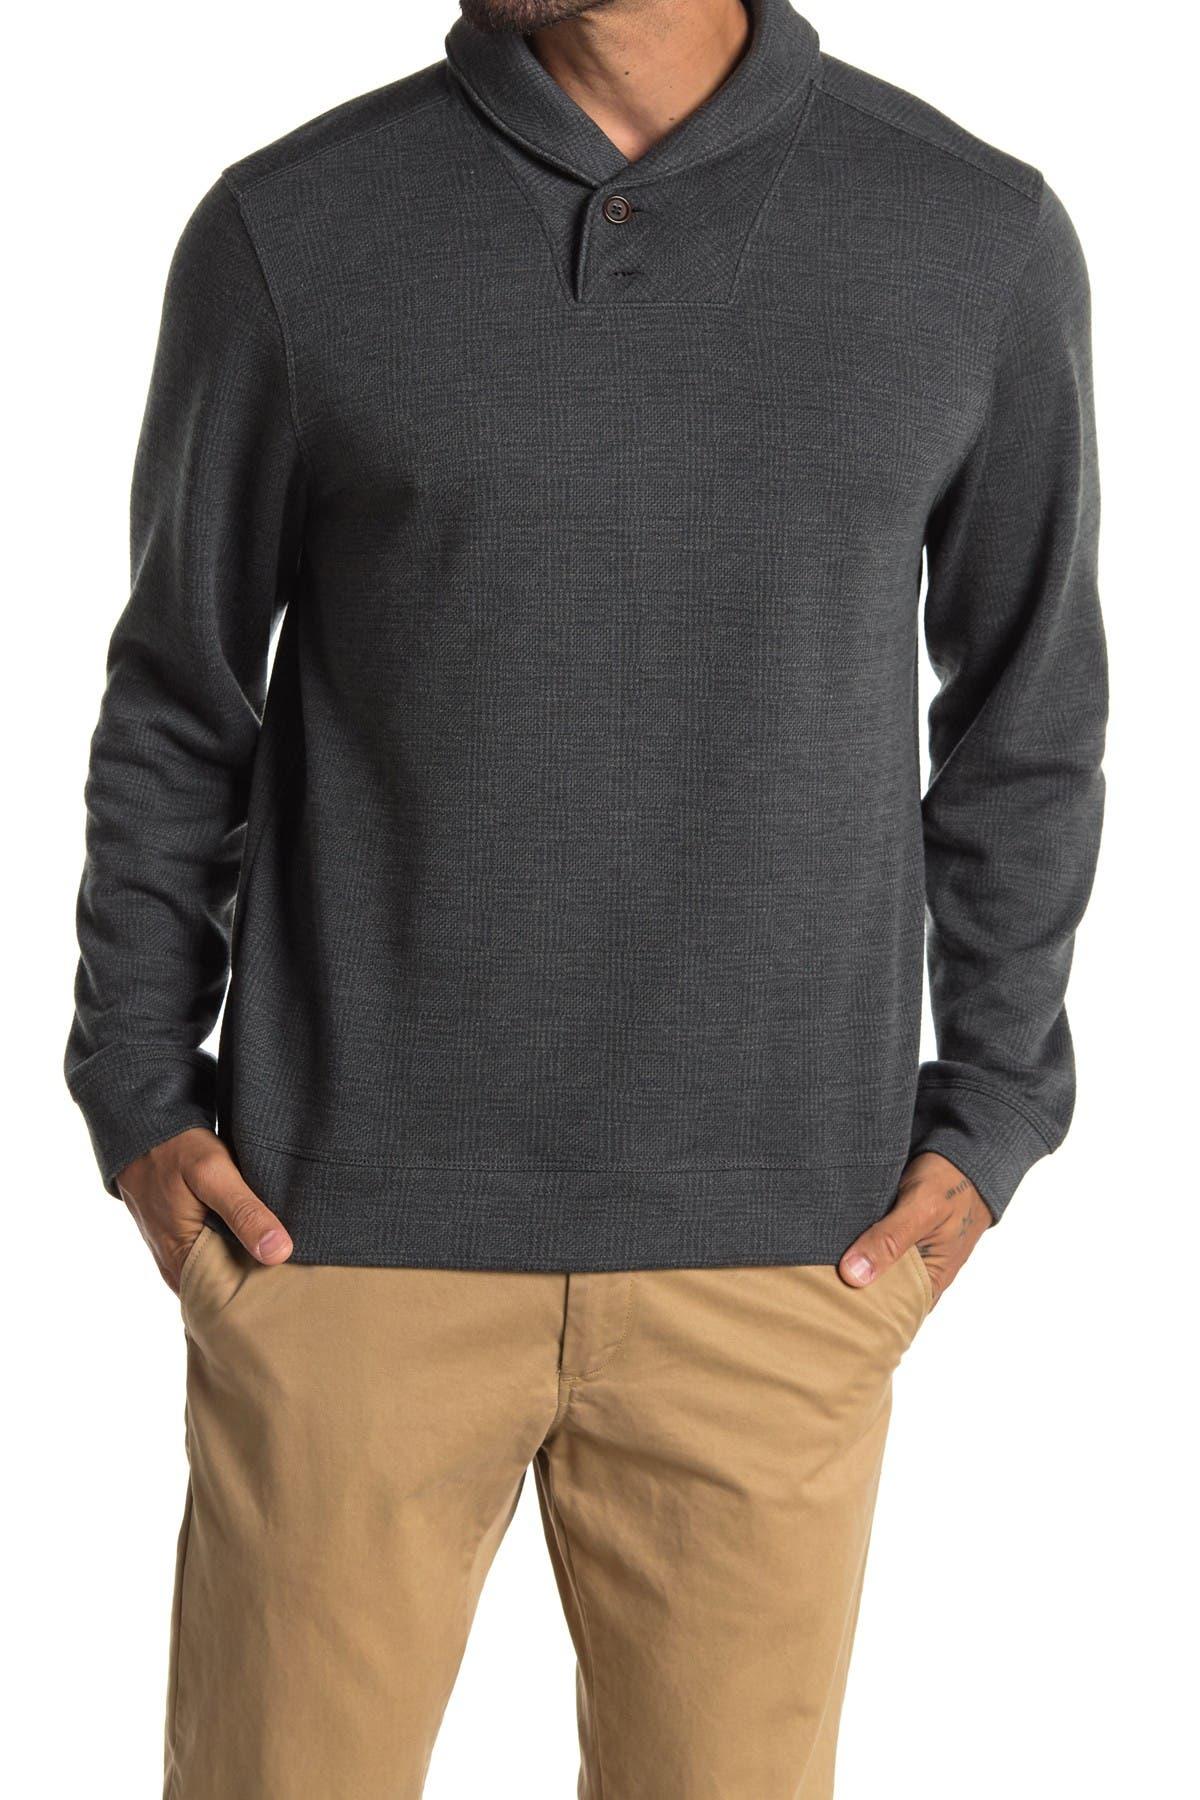 Image of Tommy Bahama Sanbar Plaid Shawl Collar Double Button Fleece Pullover